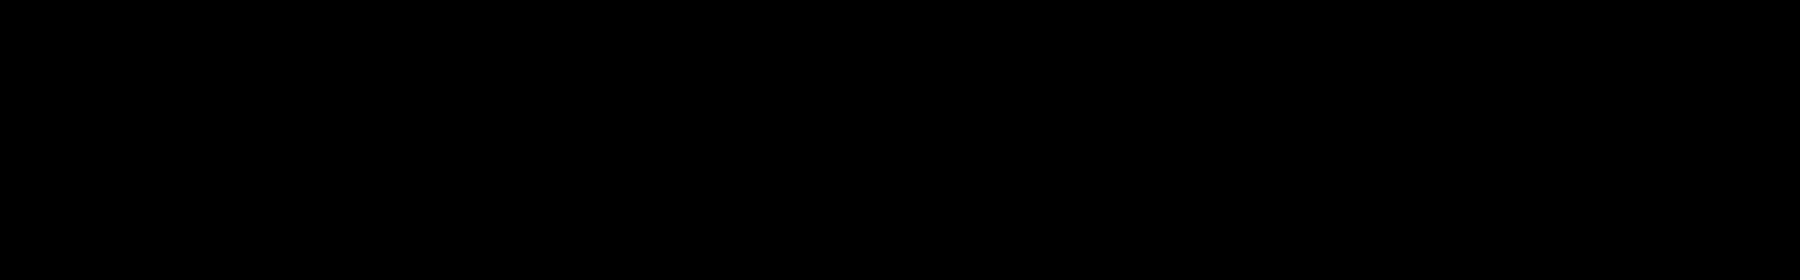 Glitch Vocalz audio waveform